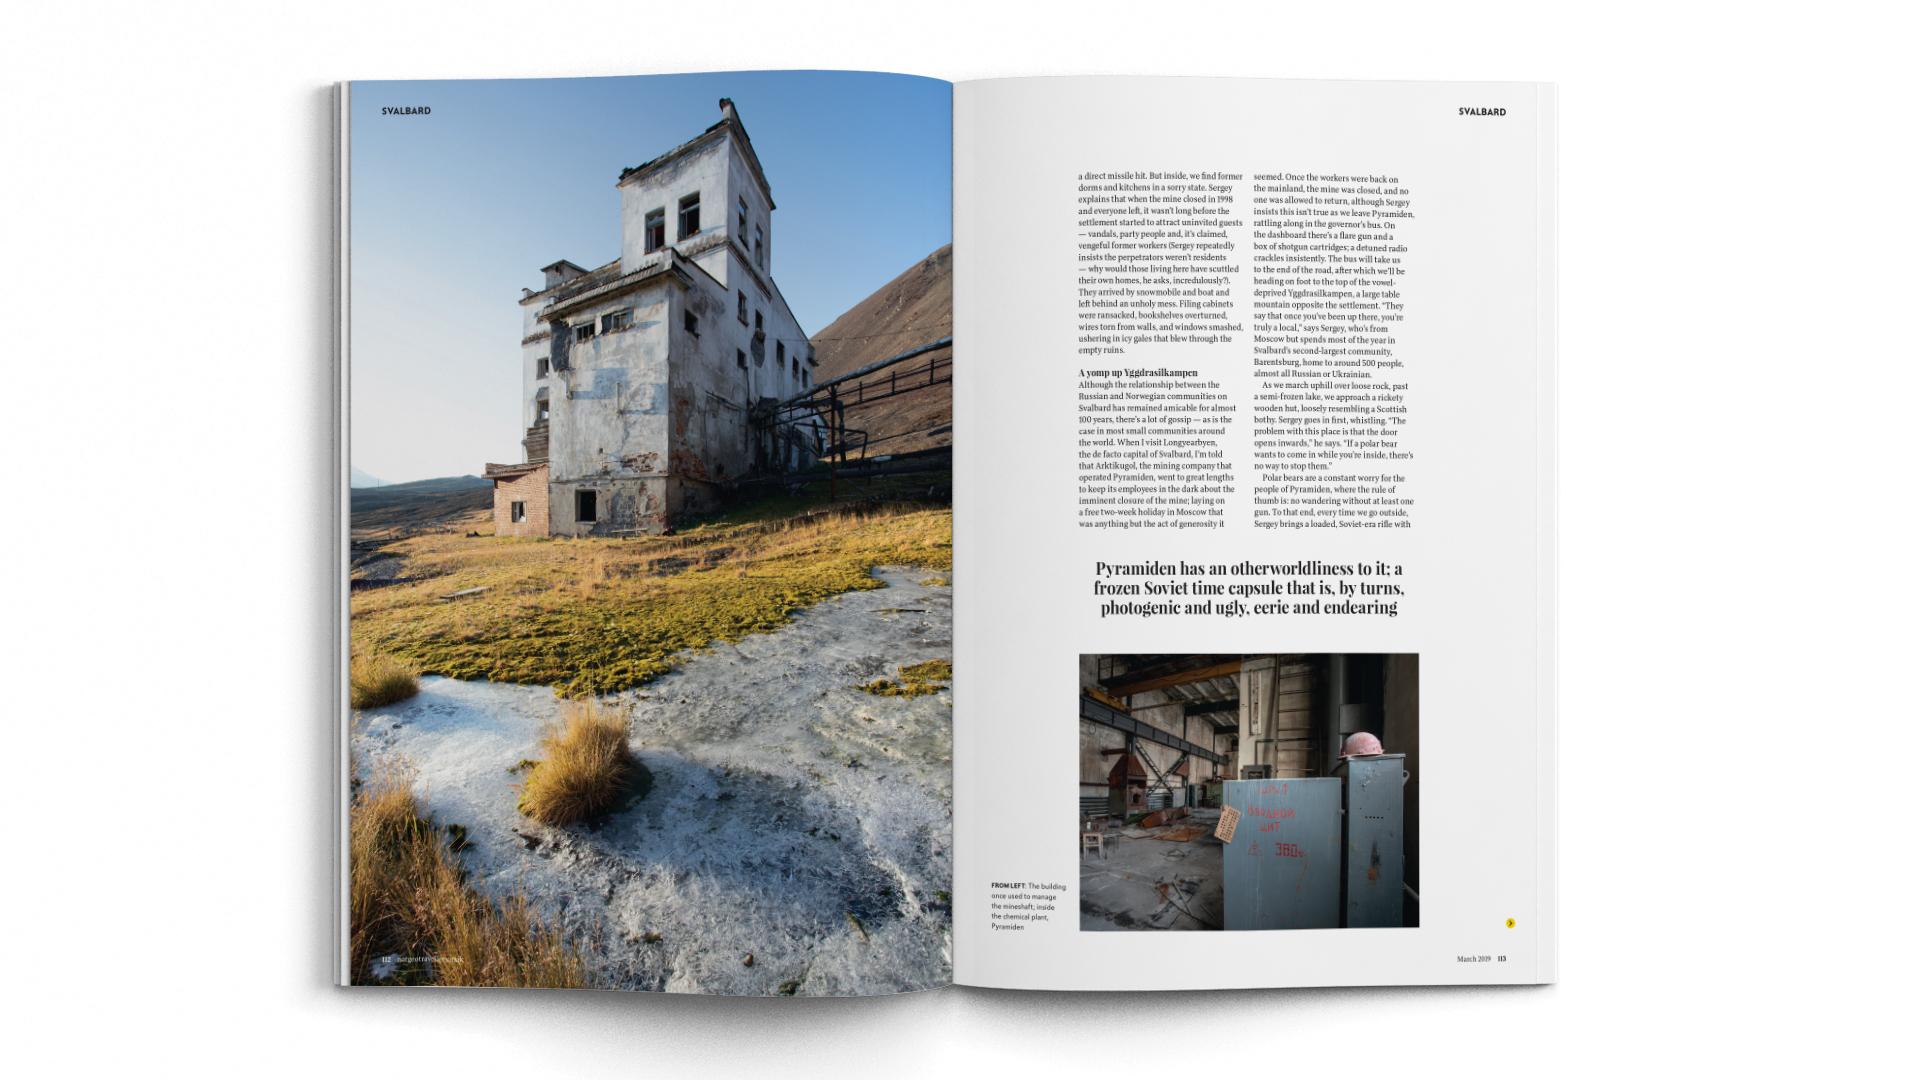 A4-Magazine-DPS-NGT-Pyramidem-3